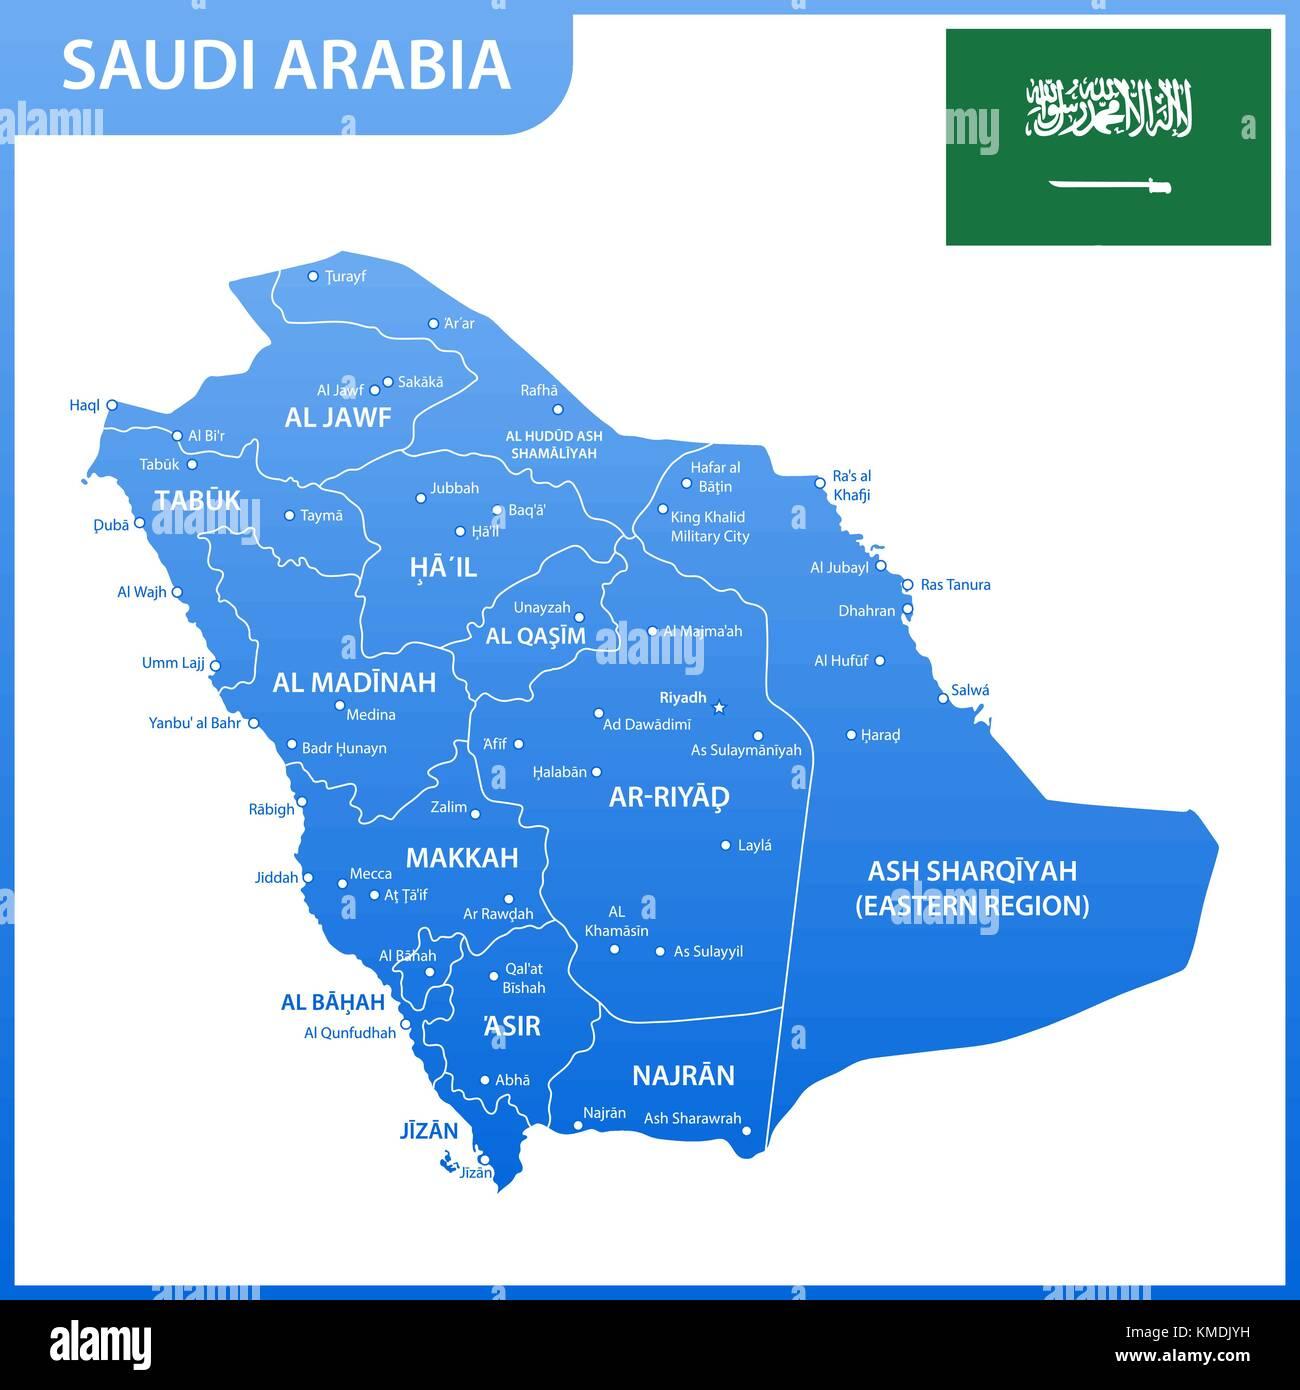 Makkah Region Stock Photos & Makkah Region Stock Images - Alamy